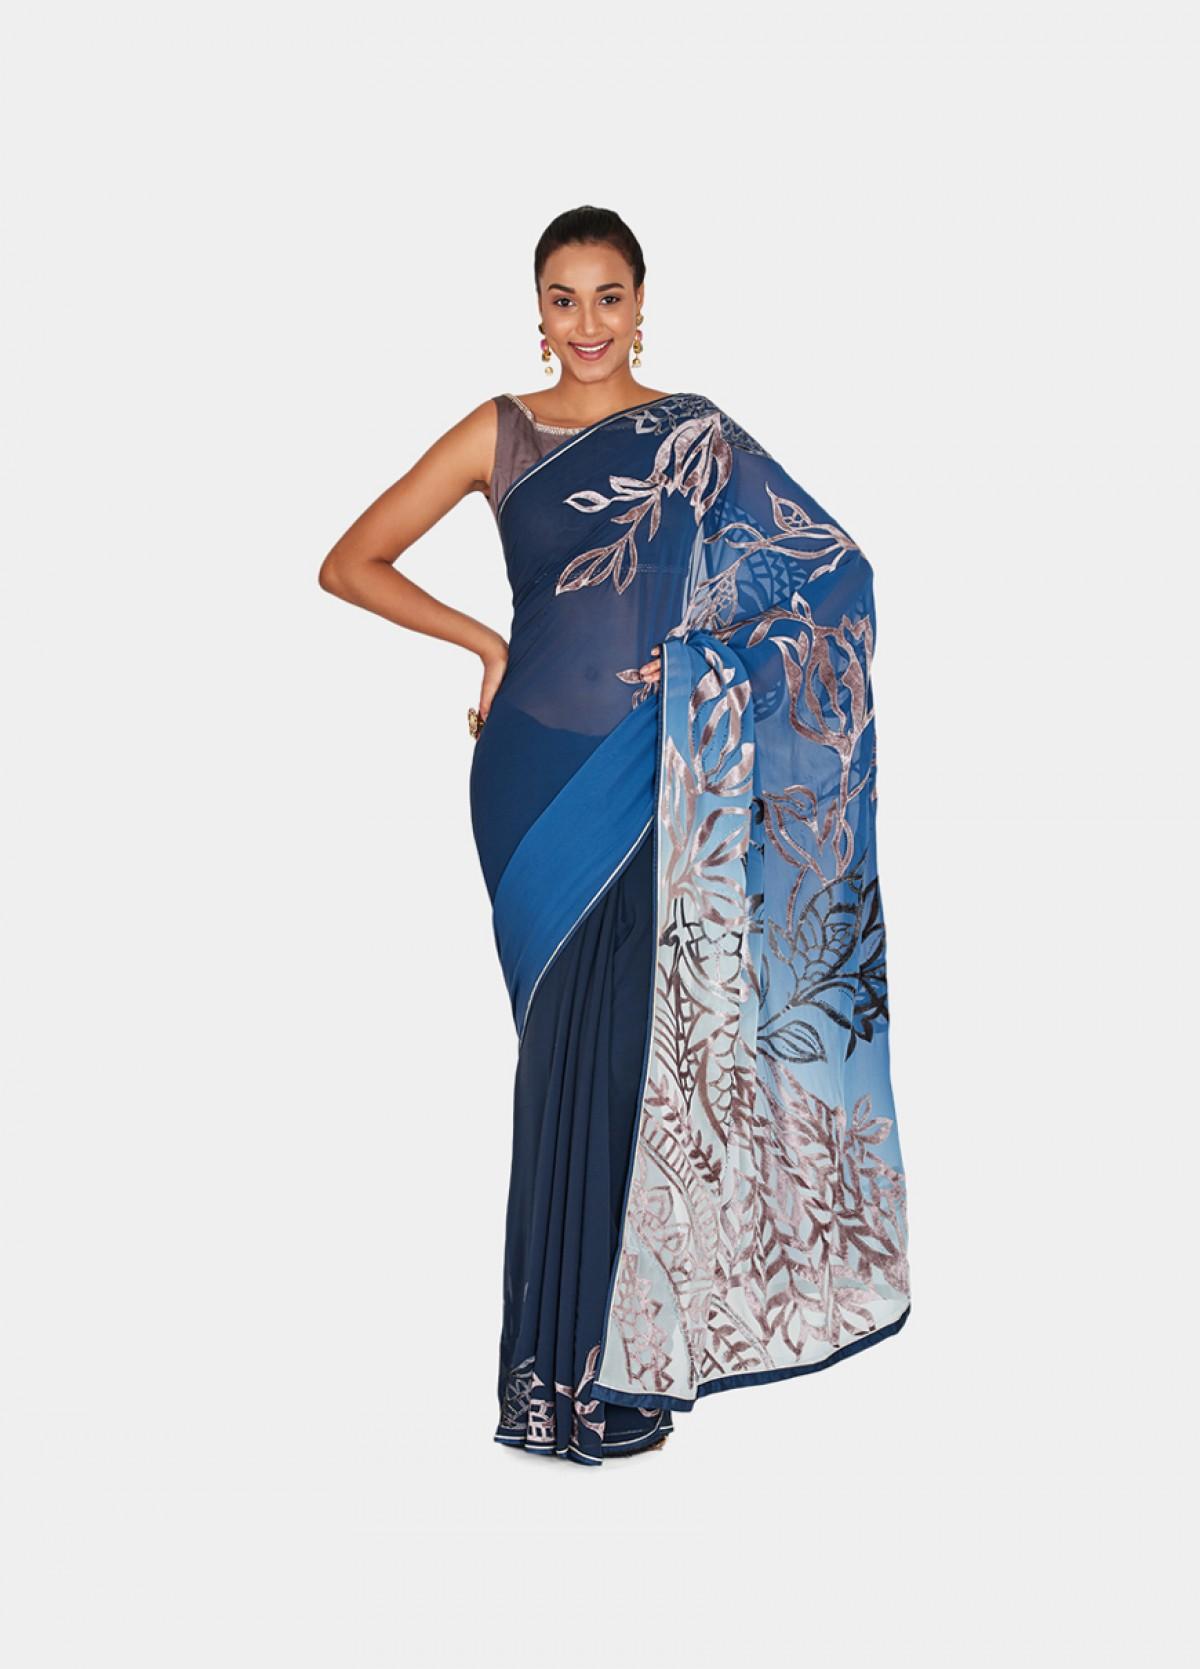 The MorePankh Sari